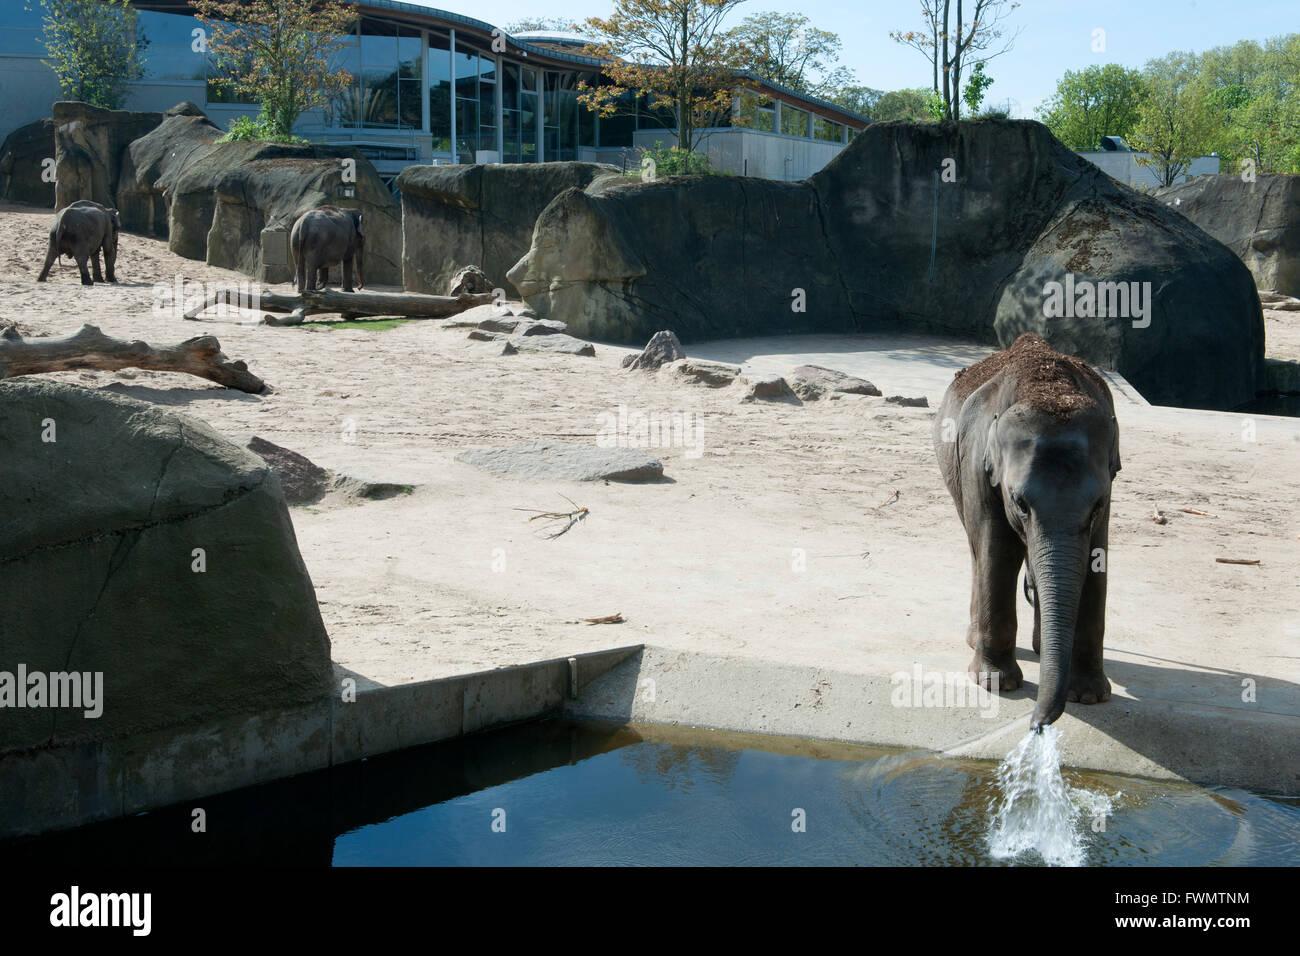 Köln, Riehl, ne Besuch em Zoo, Elefantengehege Stock Photo